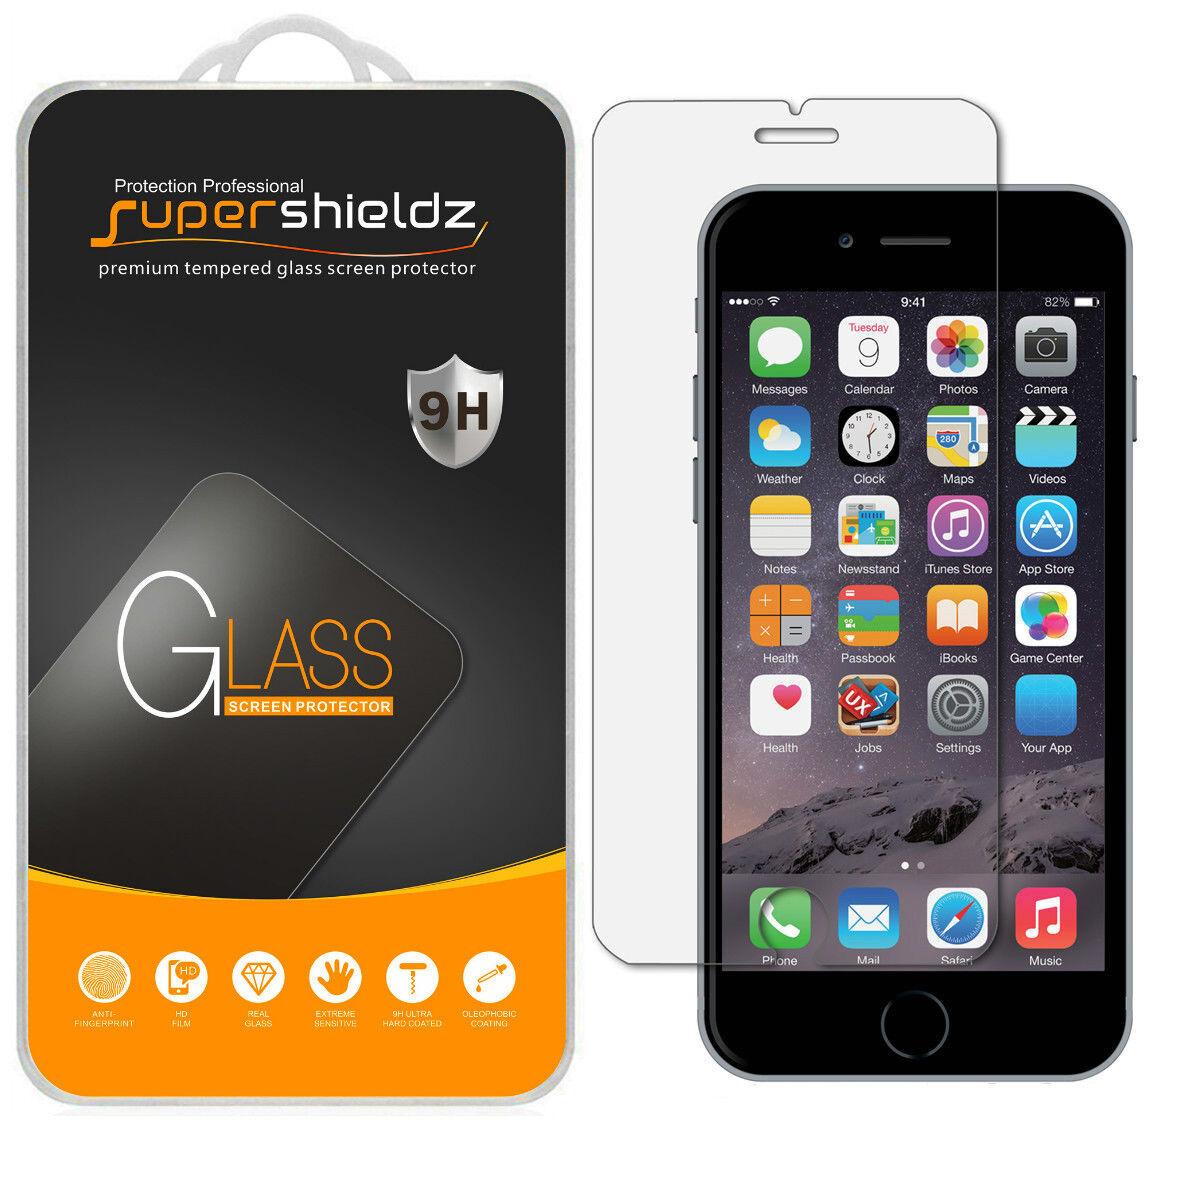 Supershieldz Ballistic Screen Protector for iPhone 6 Plus